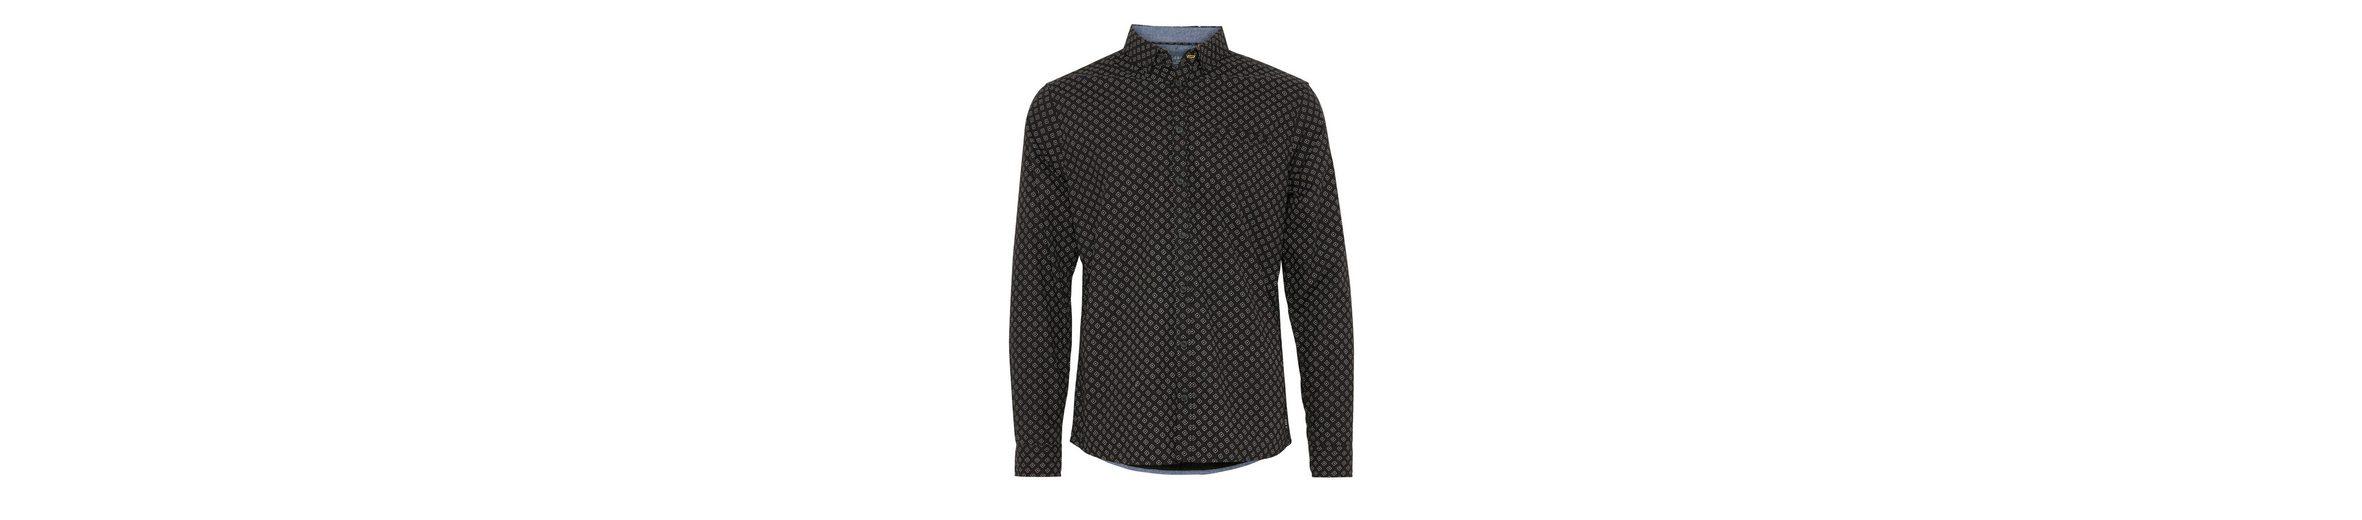 Blend Langarmhemd Online-Shopping Günstig Online Rabatt Finish Billig Freies Verschiffen 100% Original Online fUSbYVT